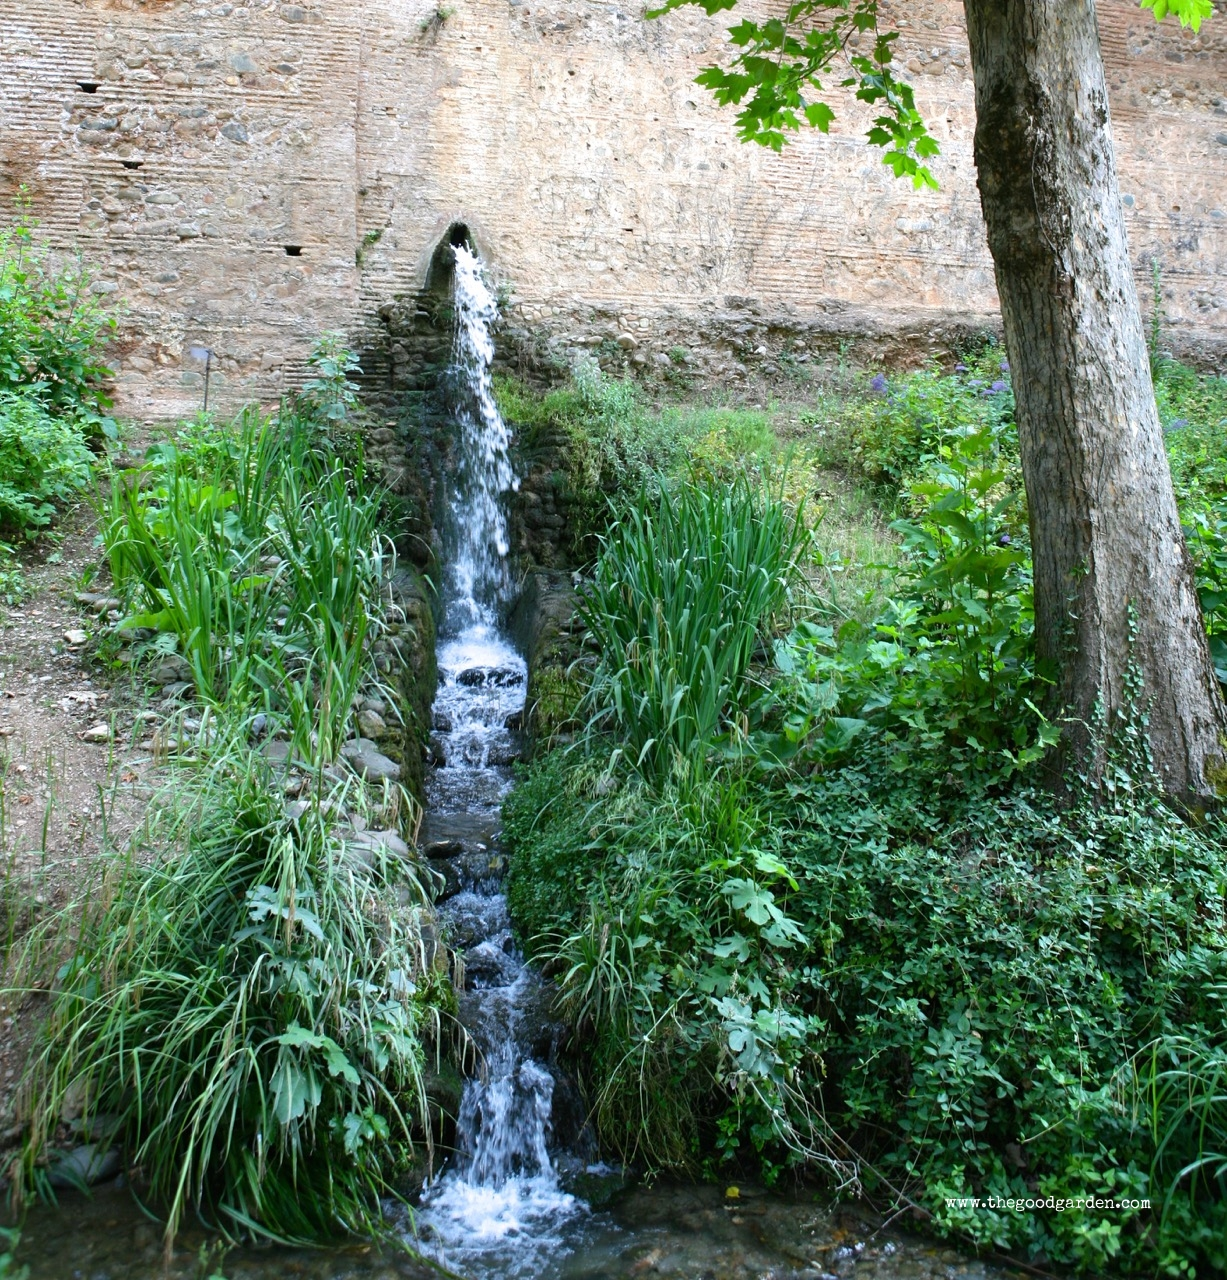 thegoodgarden|alhambra|walls|8595.jpg